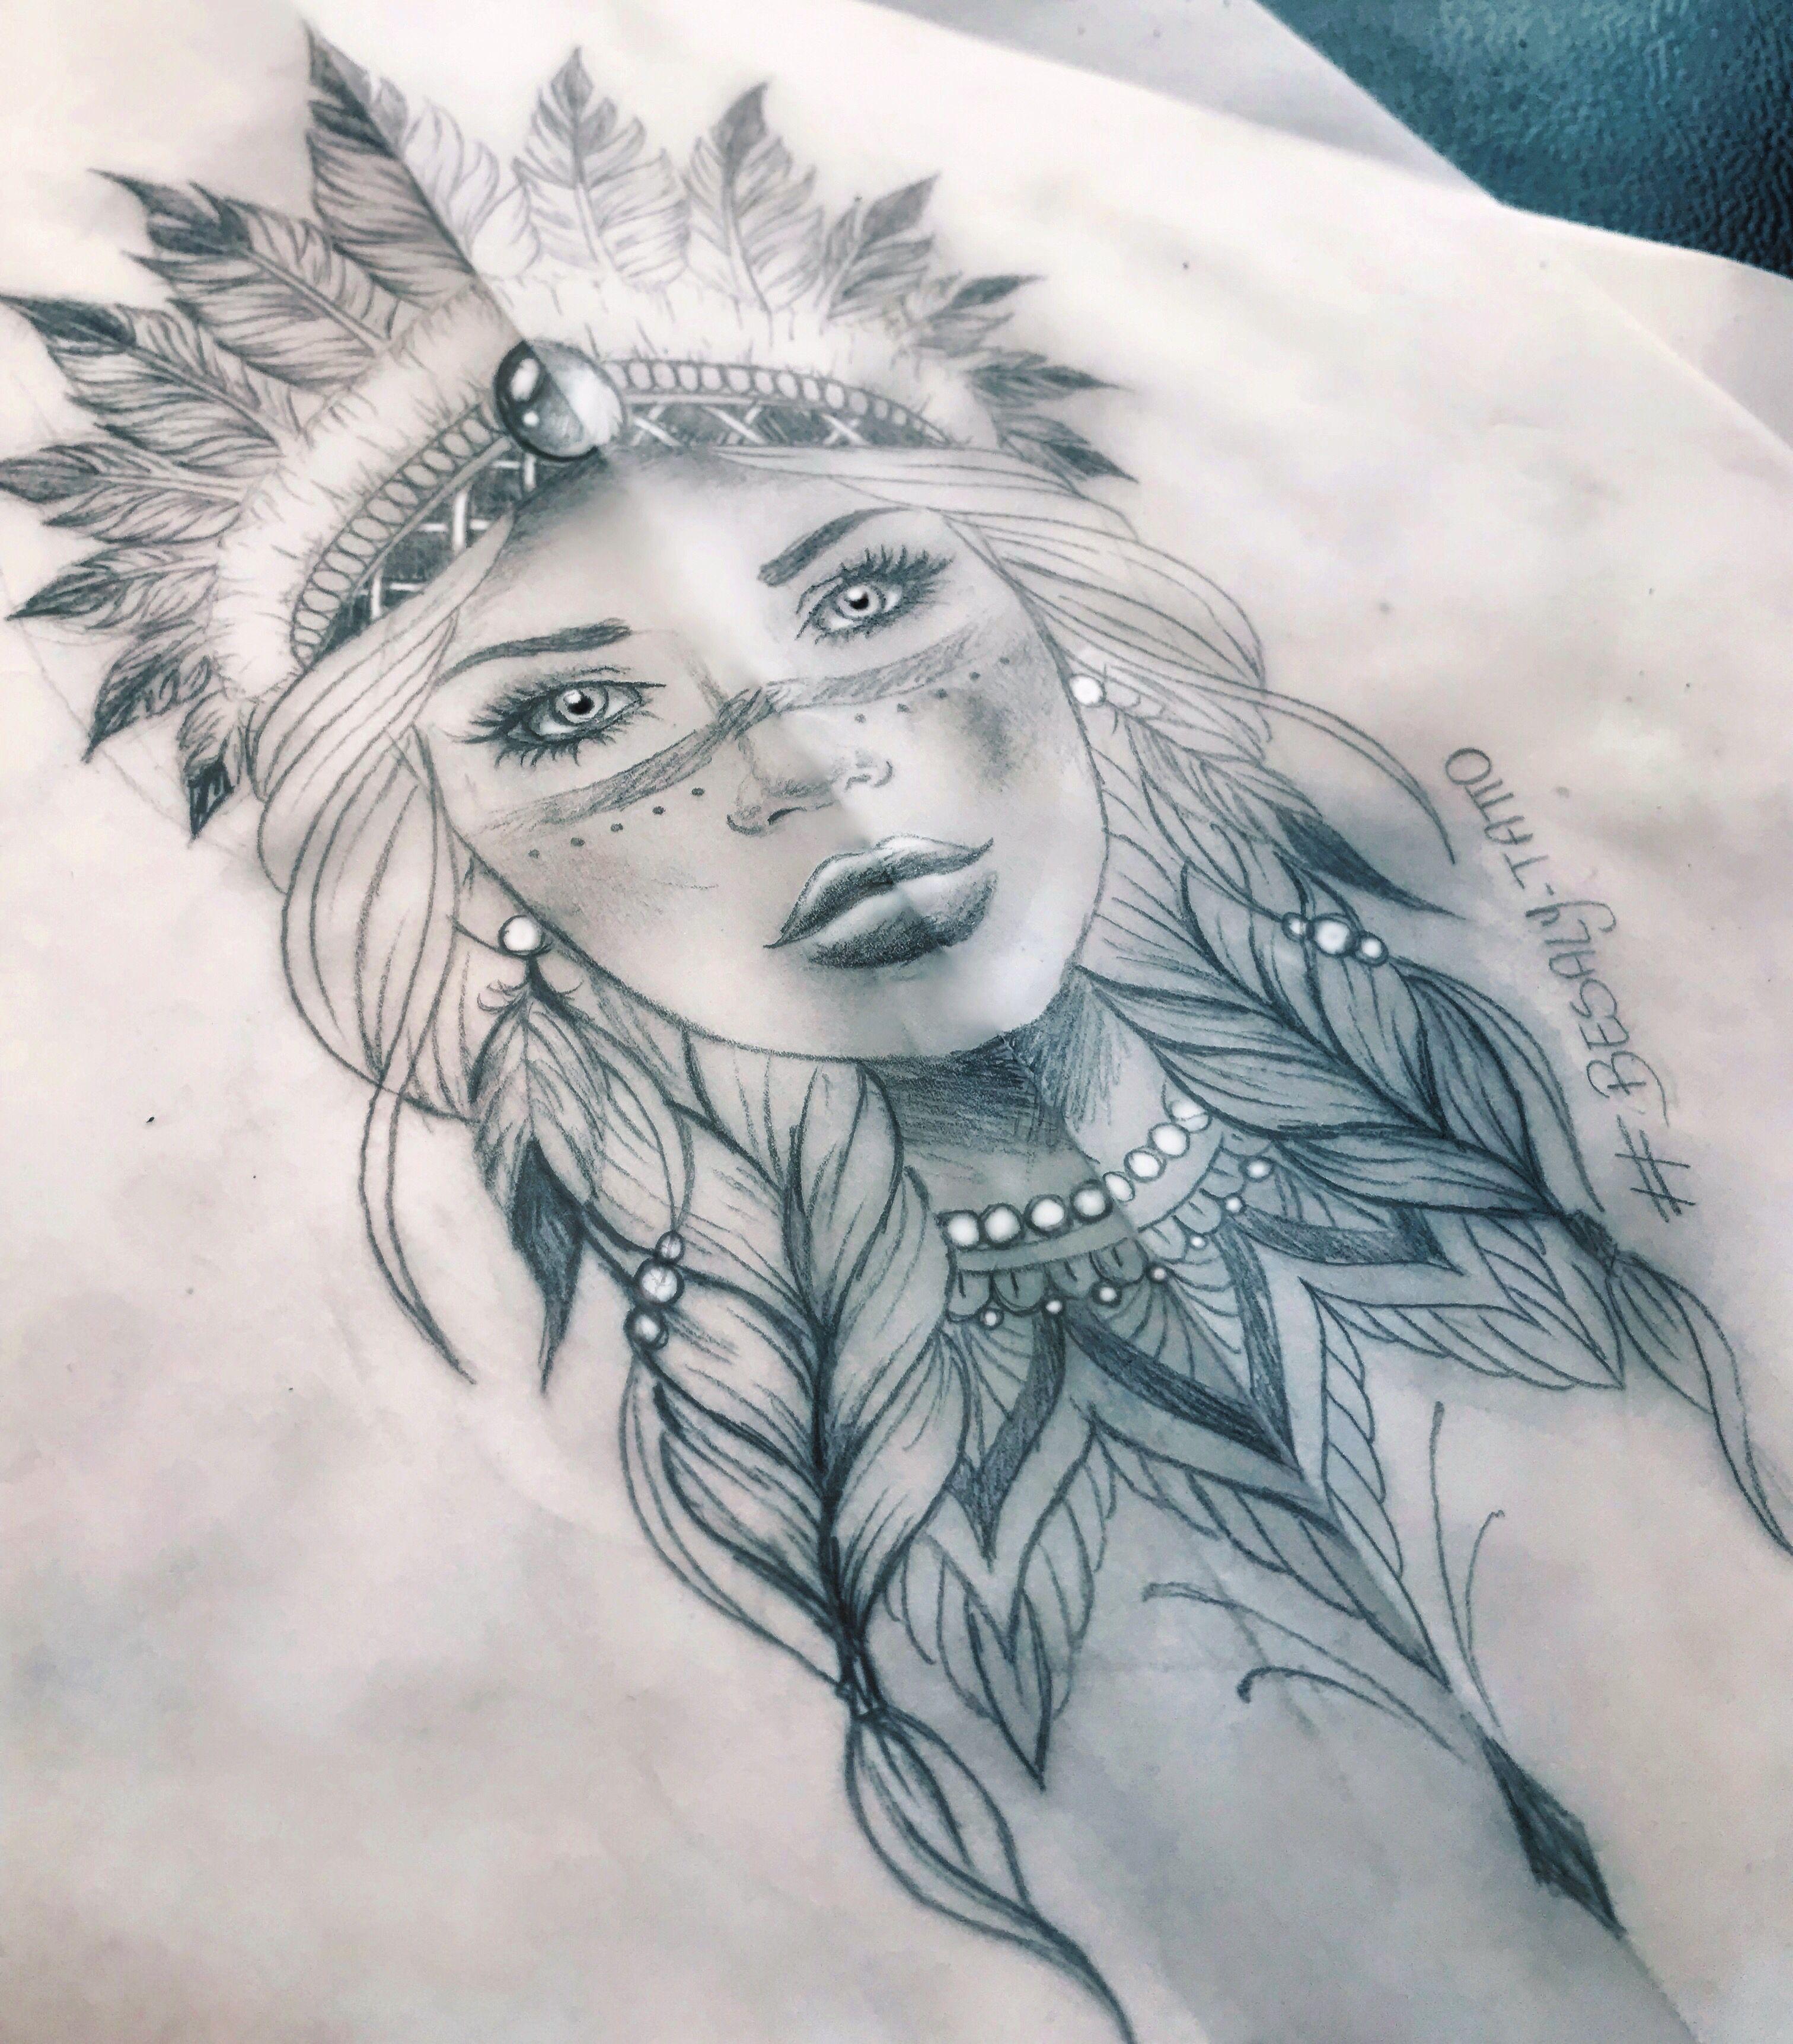 Native Indian Girl Tattoo In 2020 Native Indian Tattoos Indian Girl Tattoos Indian Tattoo